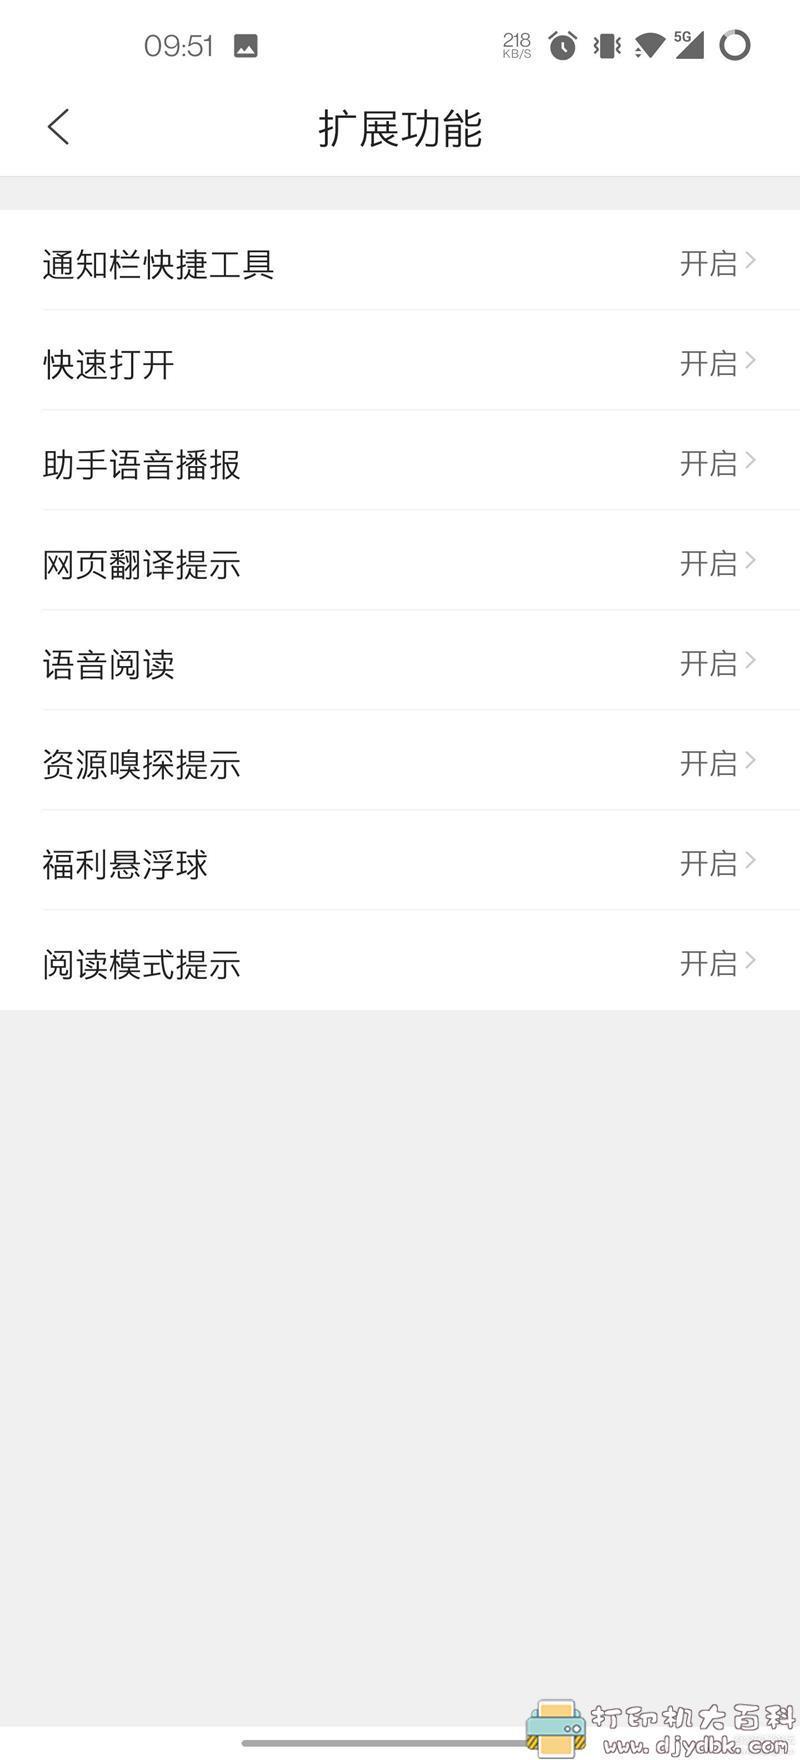 [Android]QQ浏览器_v11.3.5.5512,带资源嗅探,视频下载功能 配图 No.2